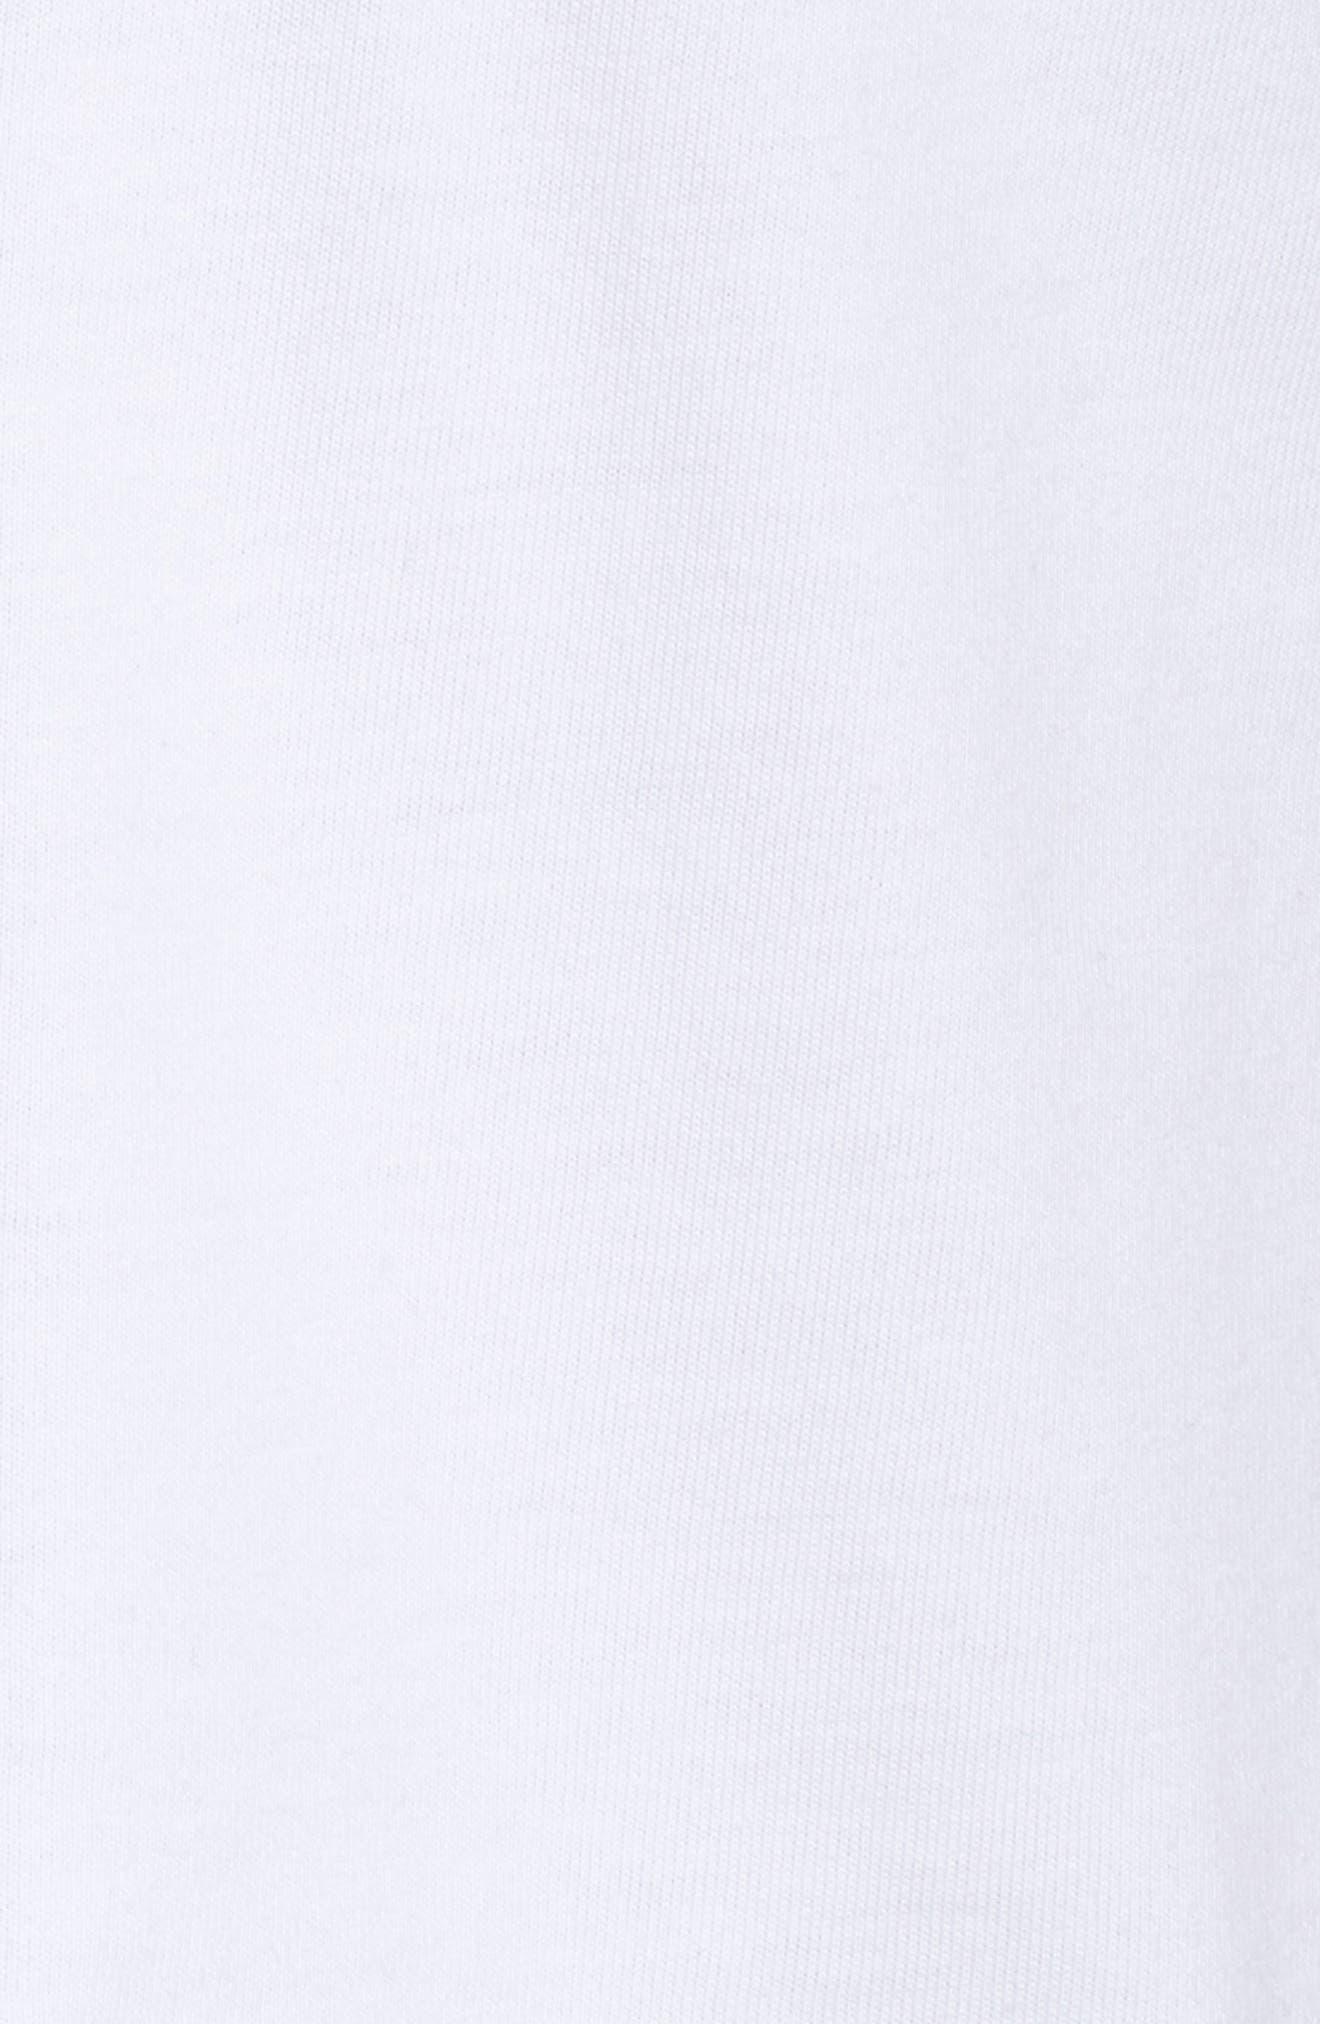 NikeLab Collection Crop Tee,                             Alternate thumbnail 6, color,                             WHITE/ BLACK